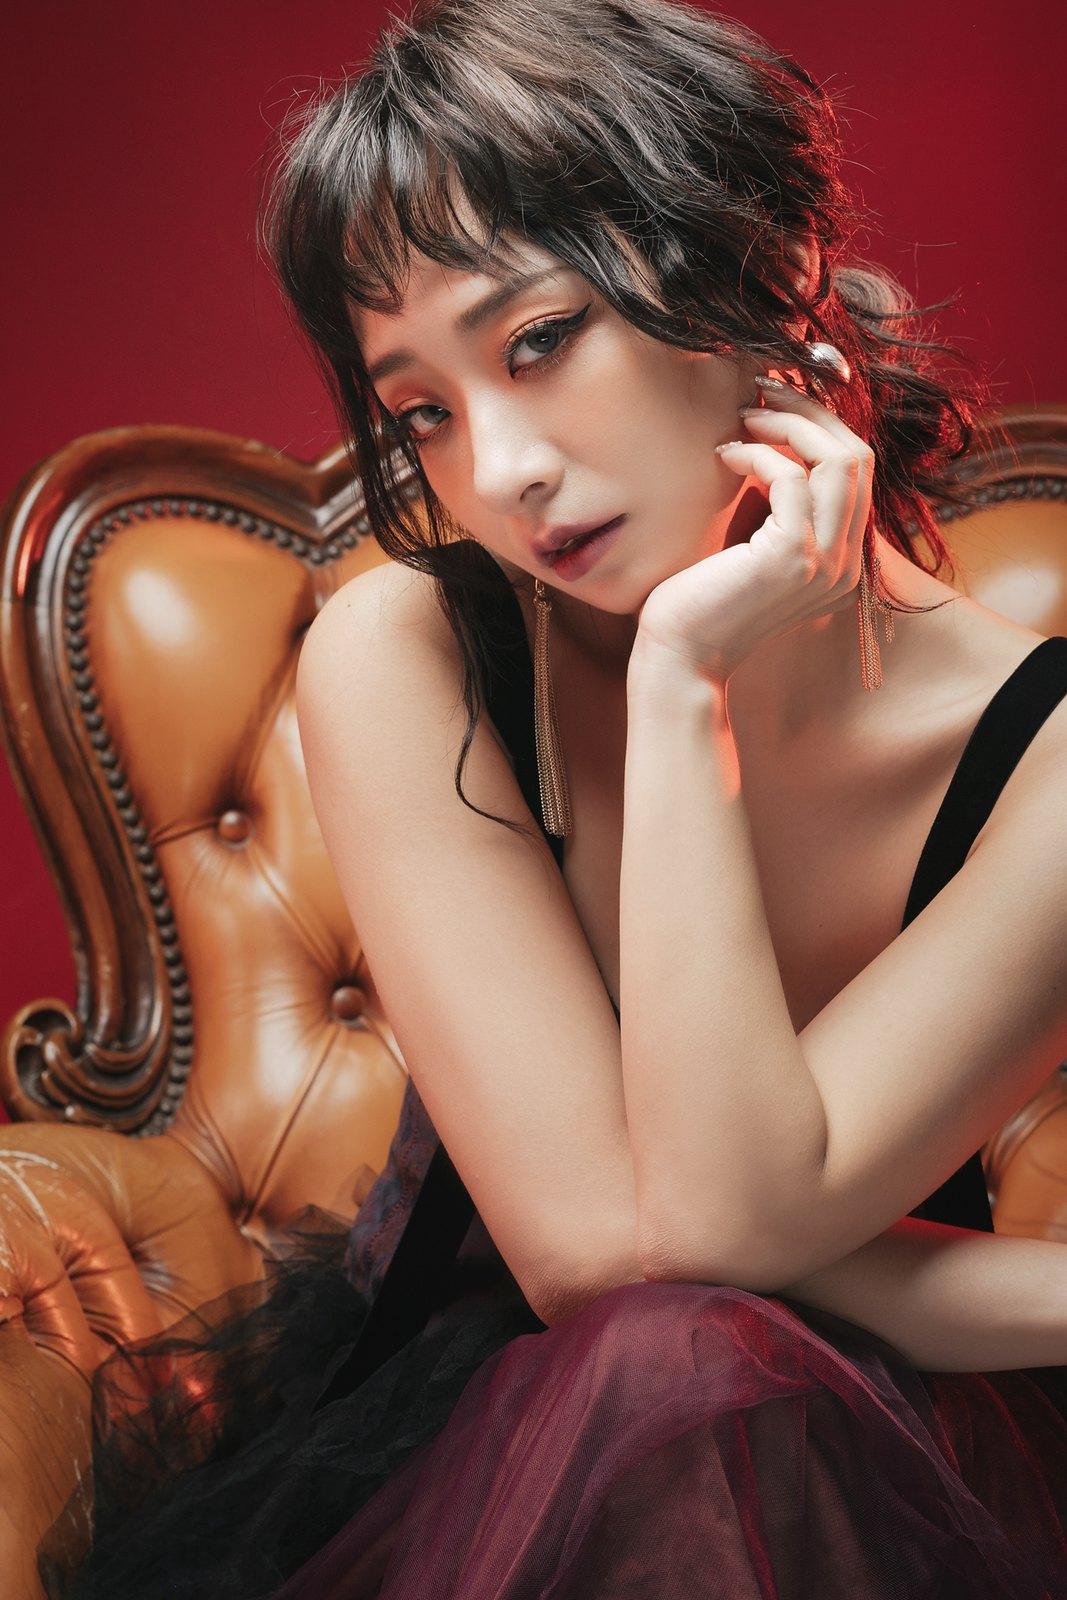 【人像攝影】Amber Lee x Gillian W. / 時尚人像 / 法鬥二棚